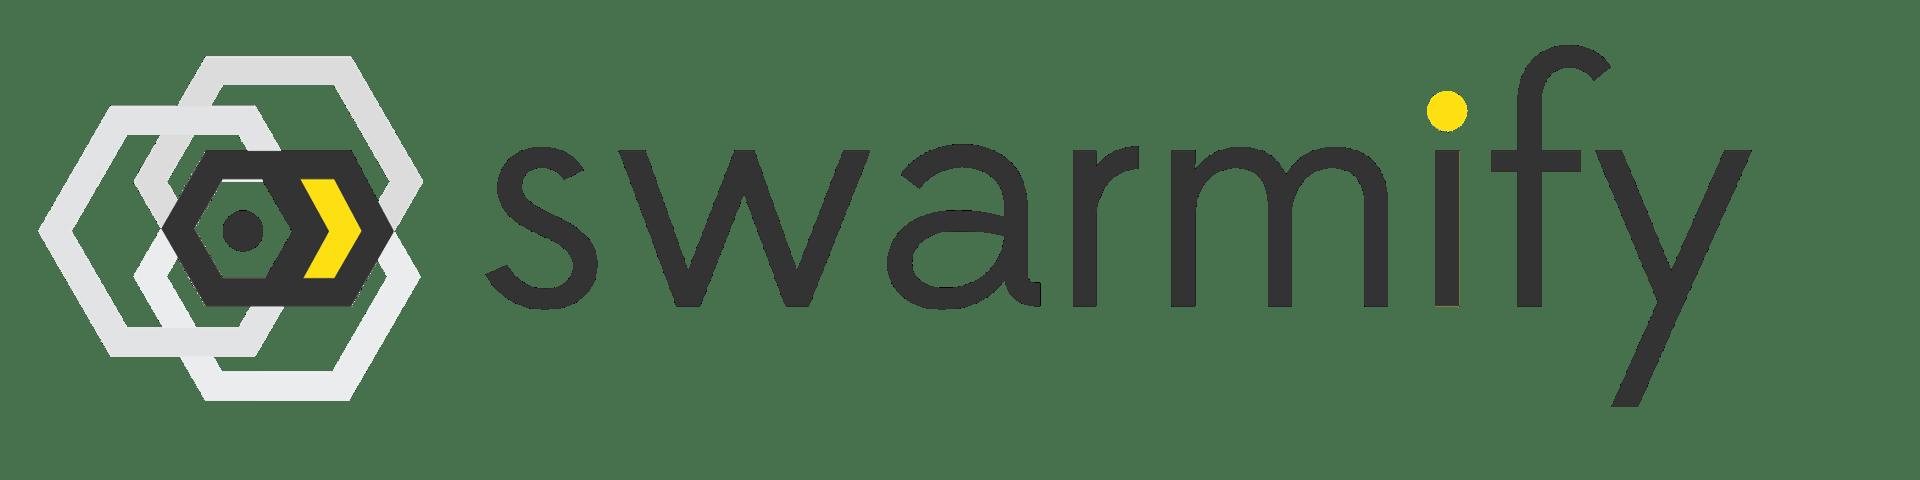 Swarmify company logo